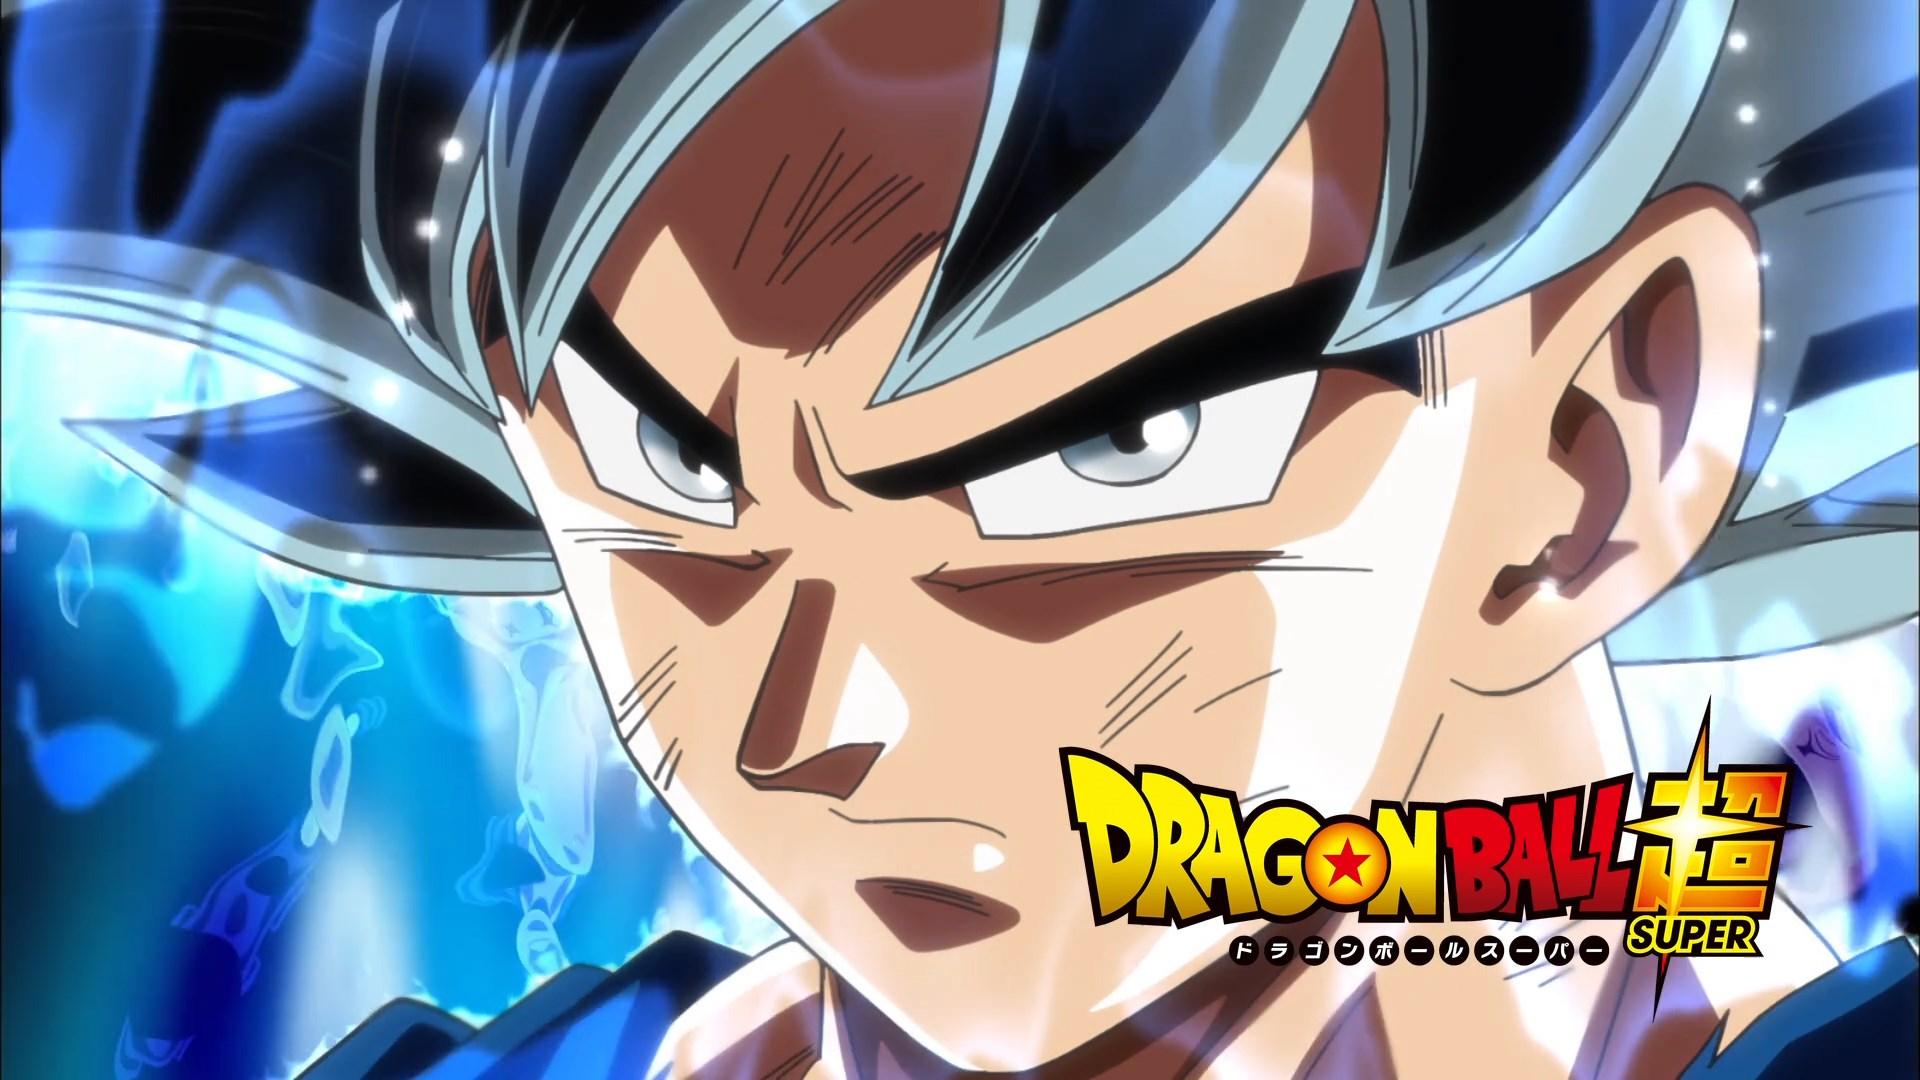 [HorribleSubs] Dragon Ball Super - 121 [1080p].mkv_snapshot_12.04